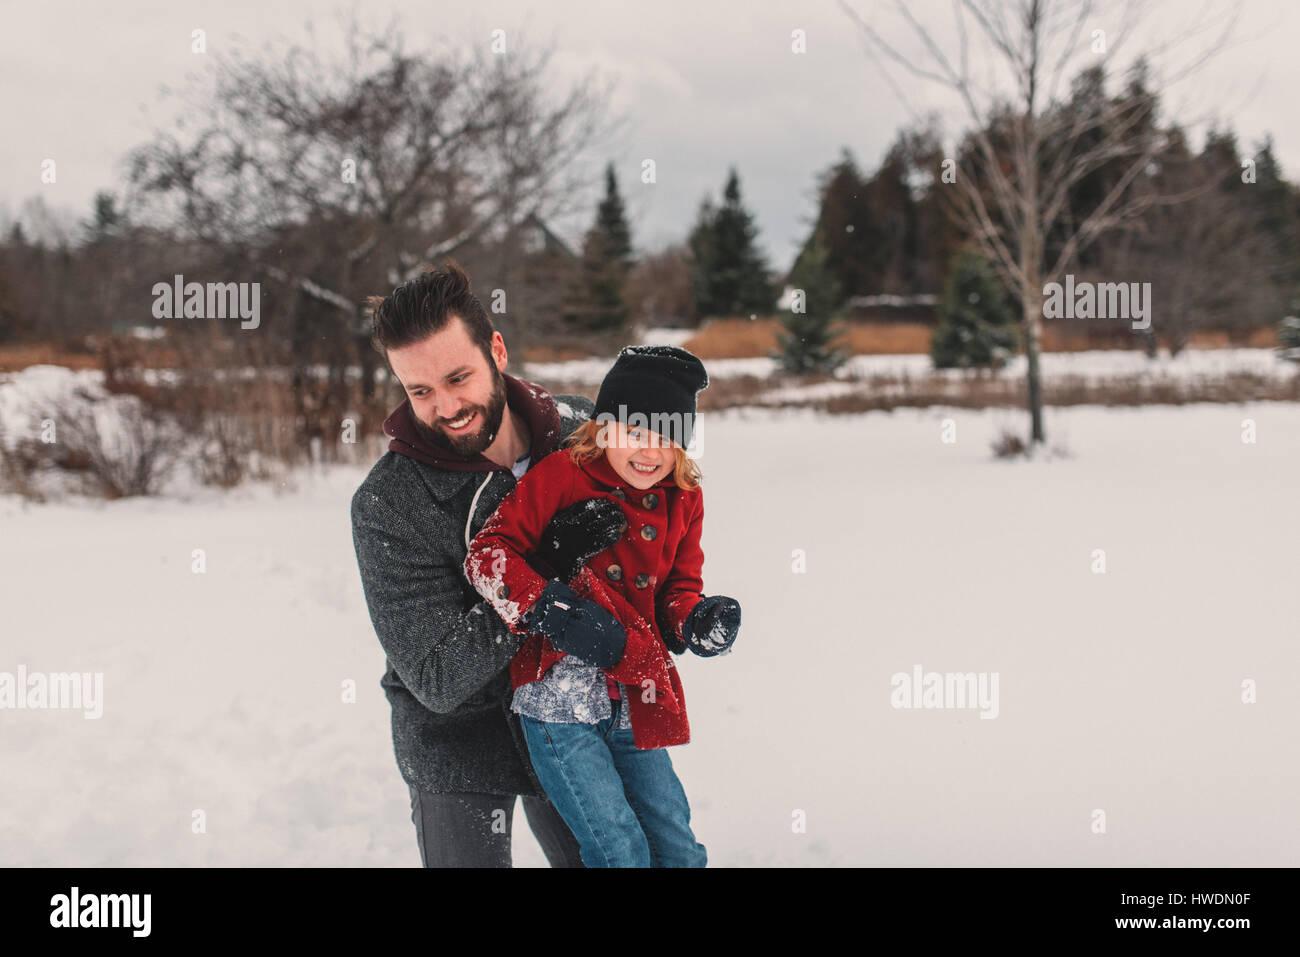 Padre e hija, jugando en la nieve Imagen De Stock